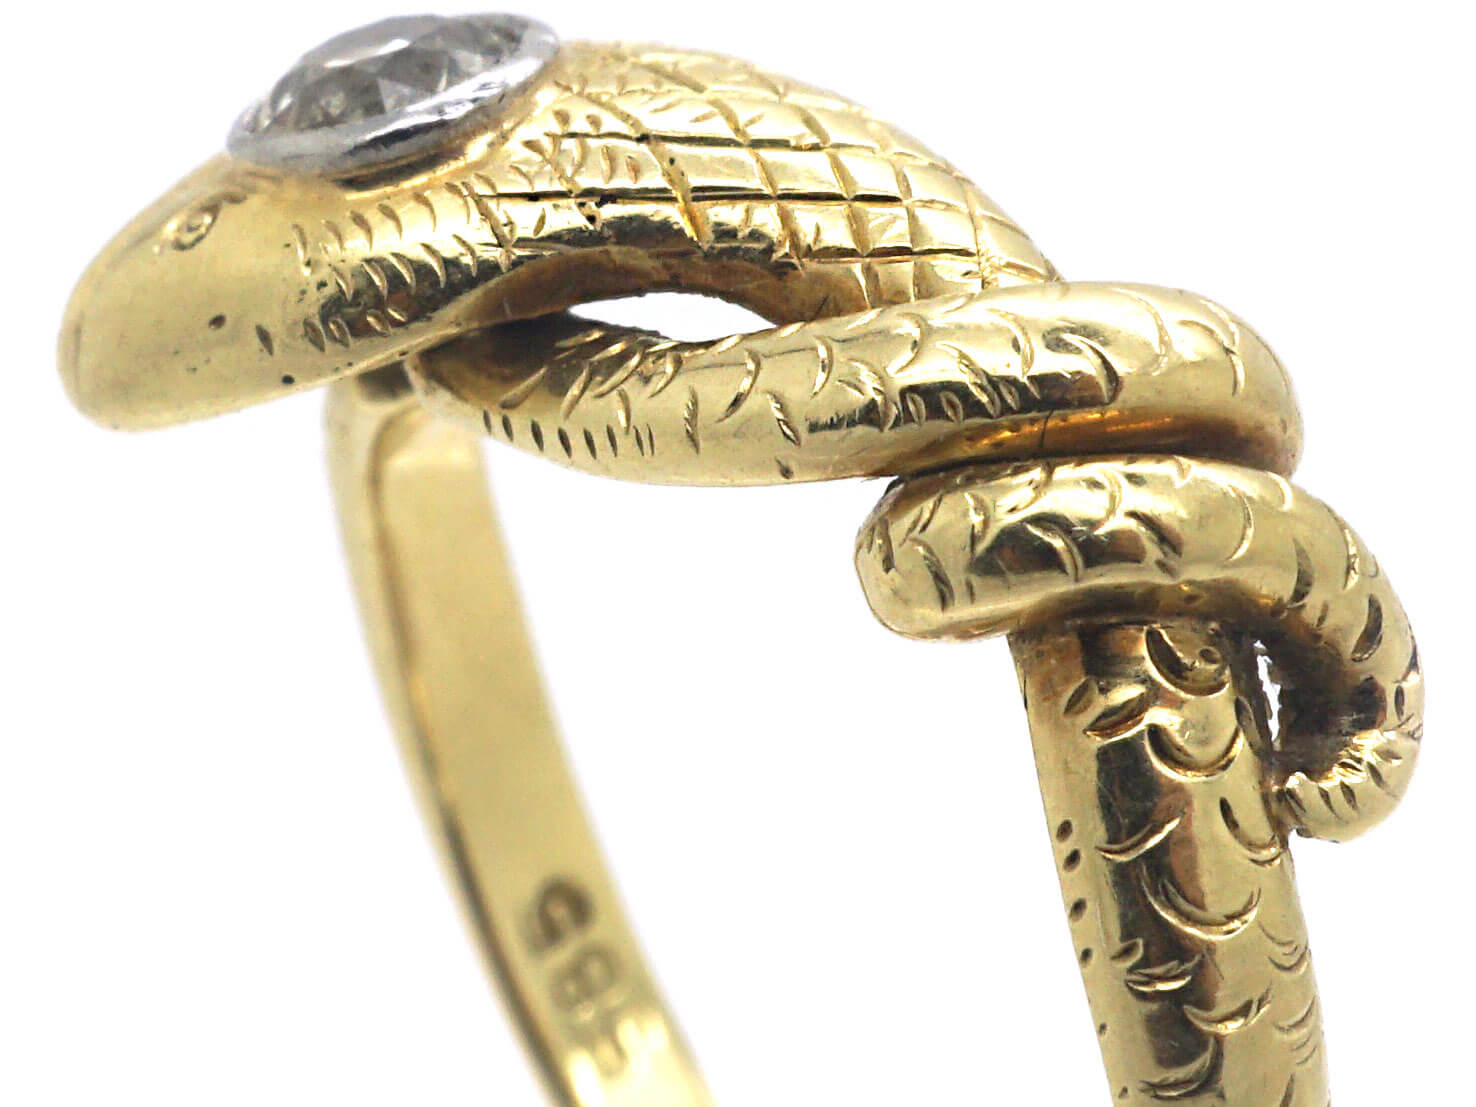 Edwardian 14ct Gold & Platinum Snake Ring set with a Diamond